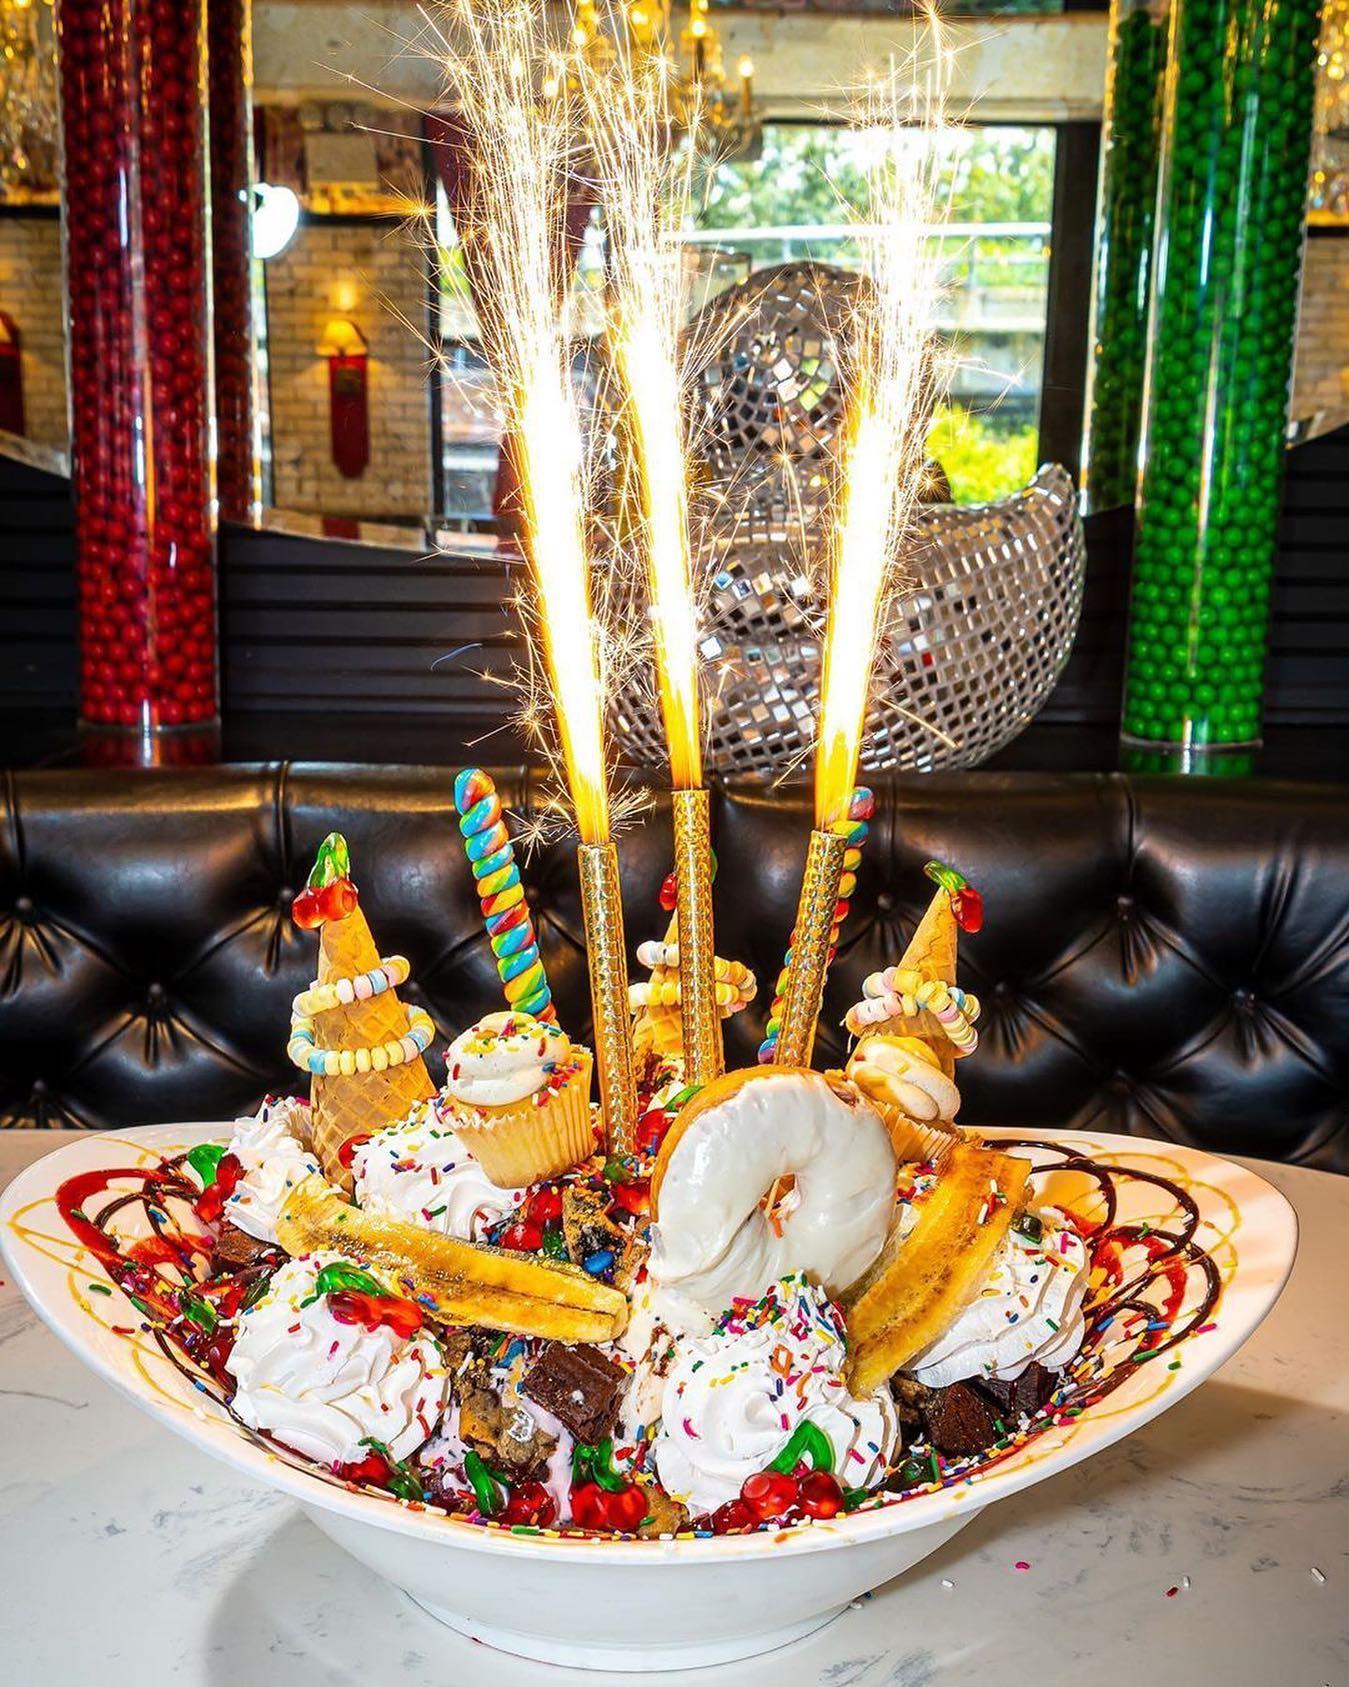 An outrageous ice cream sundae with sparklers on top